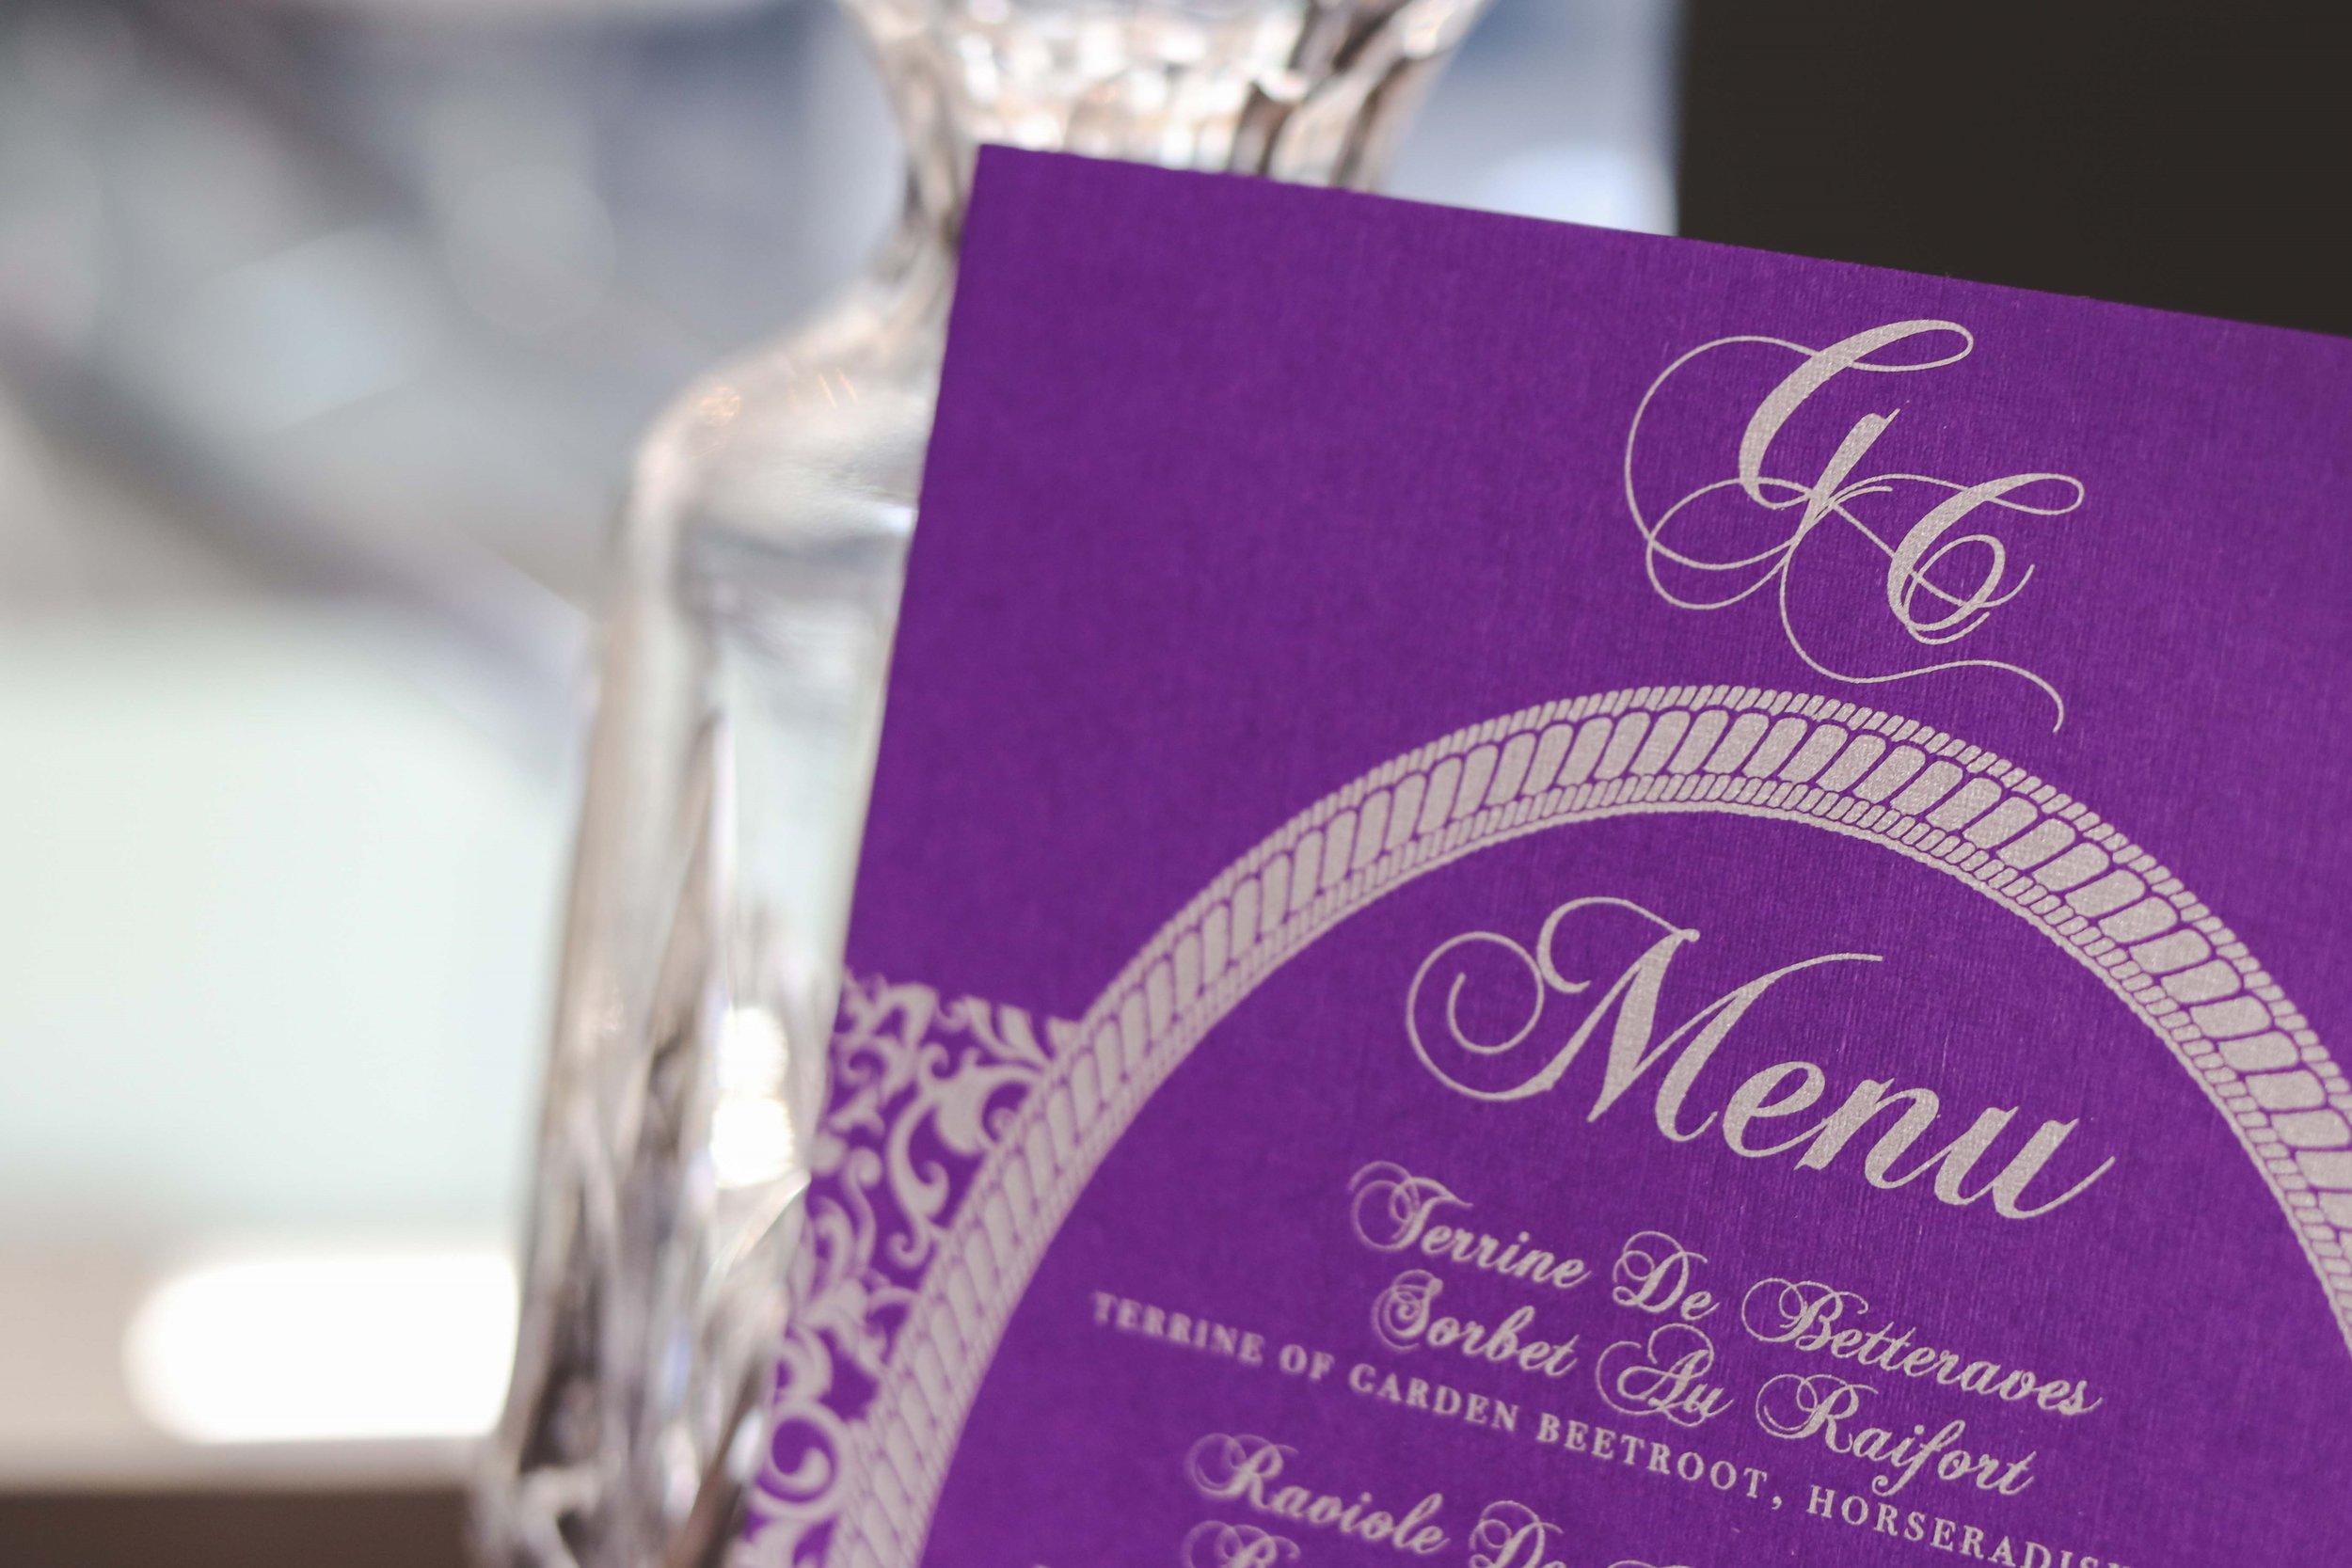 Menu in purple and silver